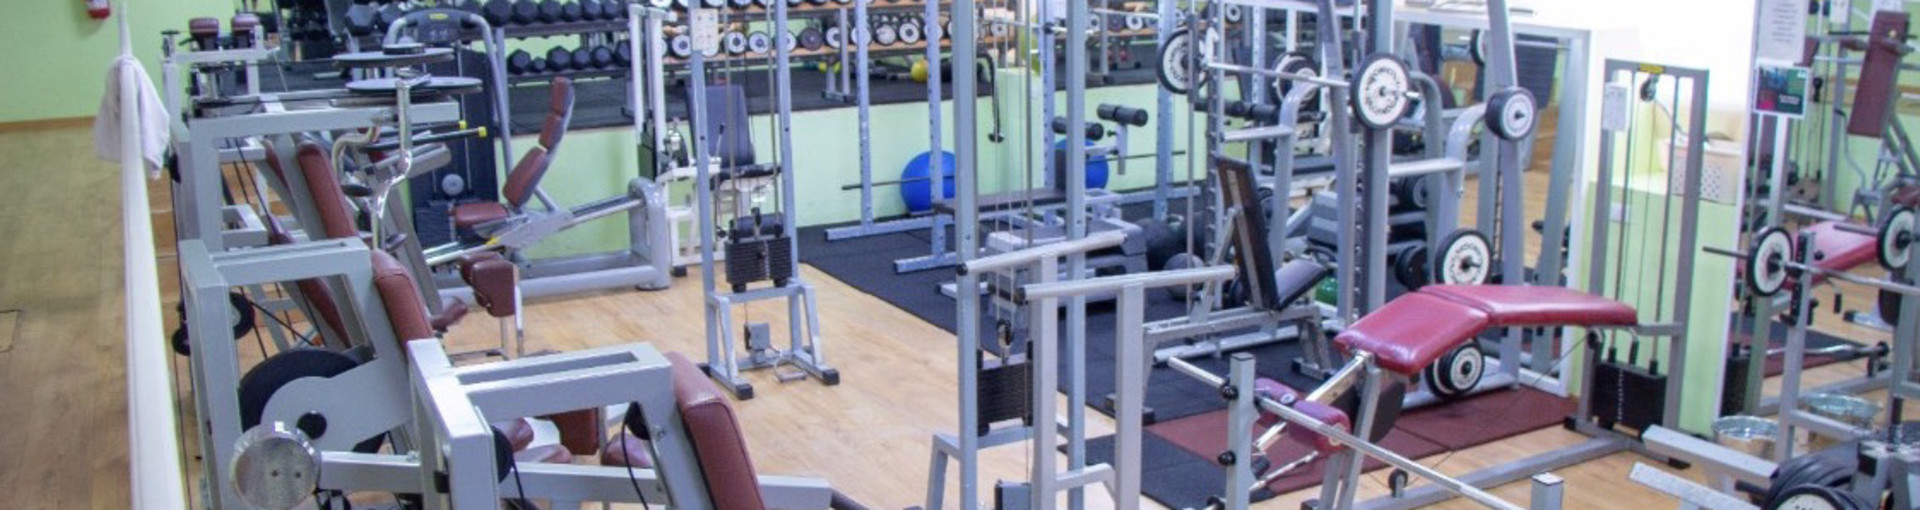 Jem Fitness -